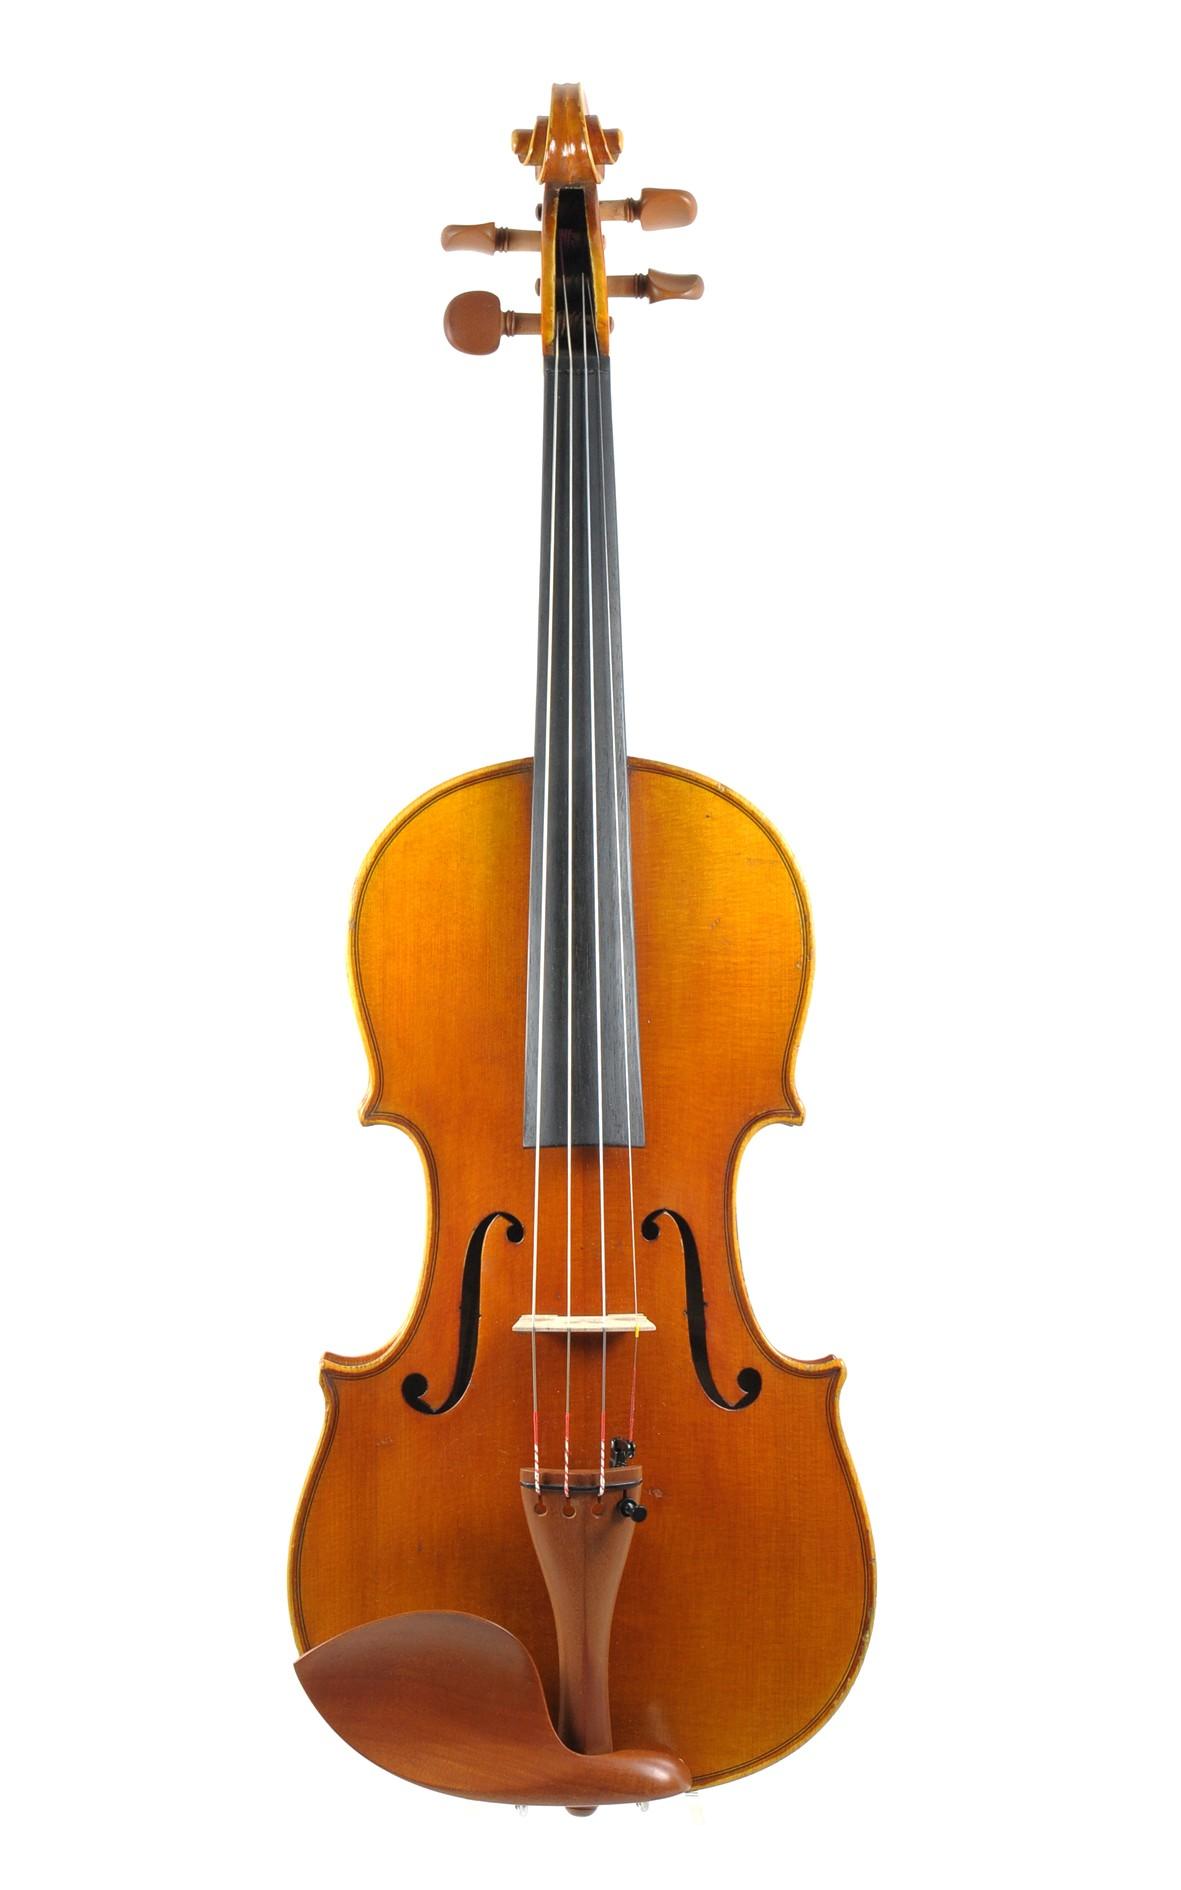 Franz Anton Hausmann, violin, approx. 1920 - top view